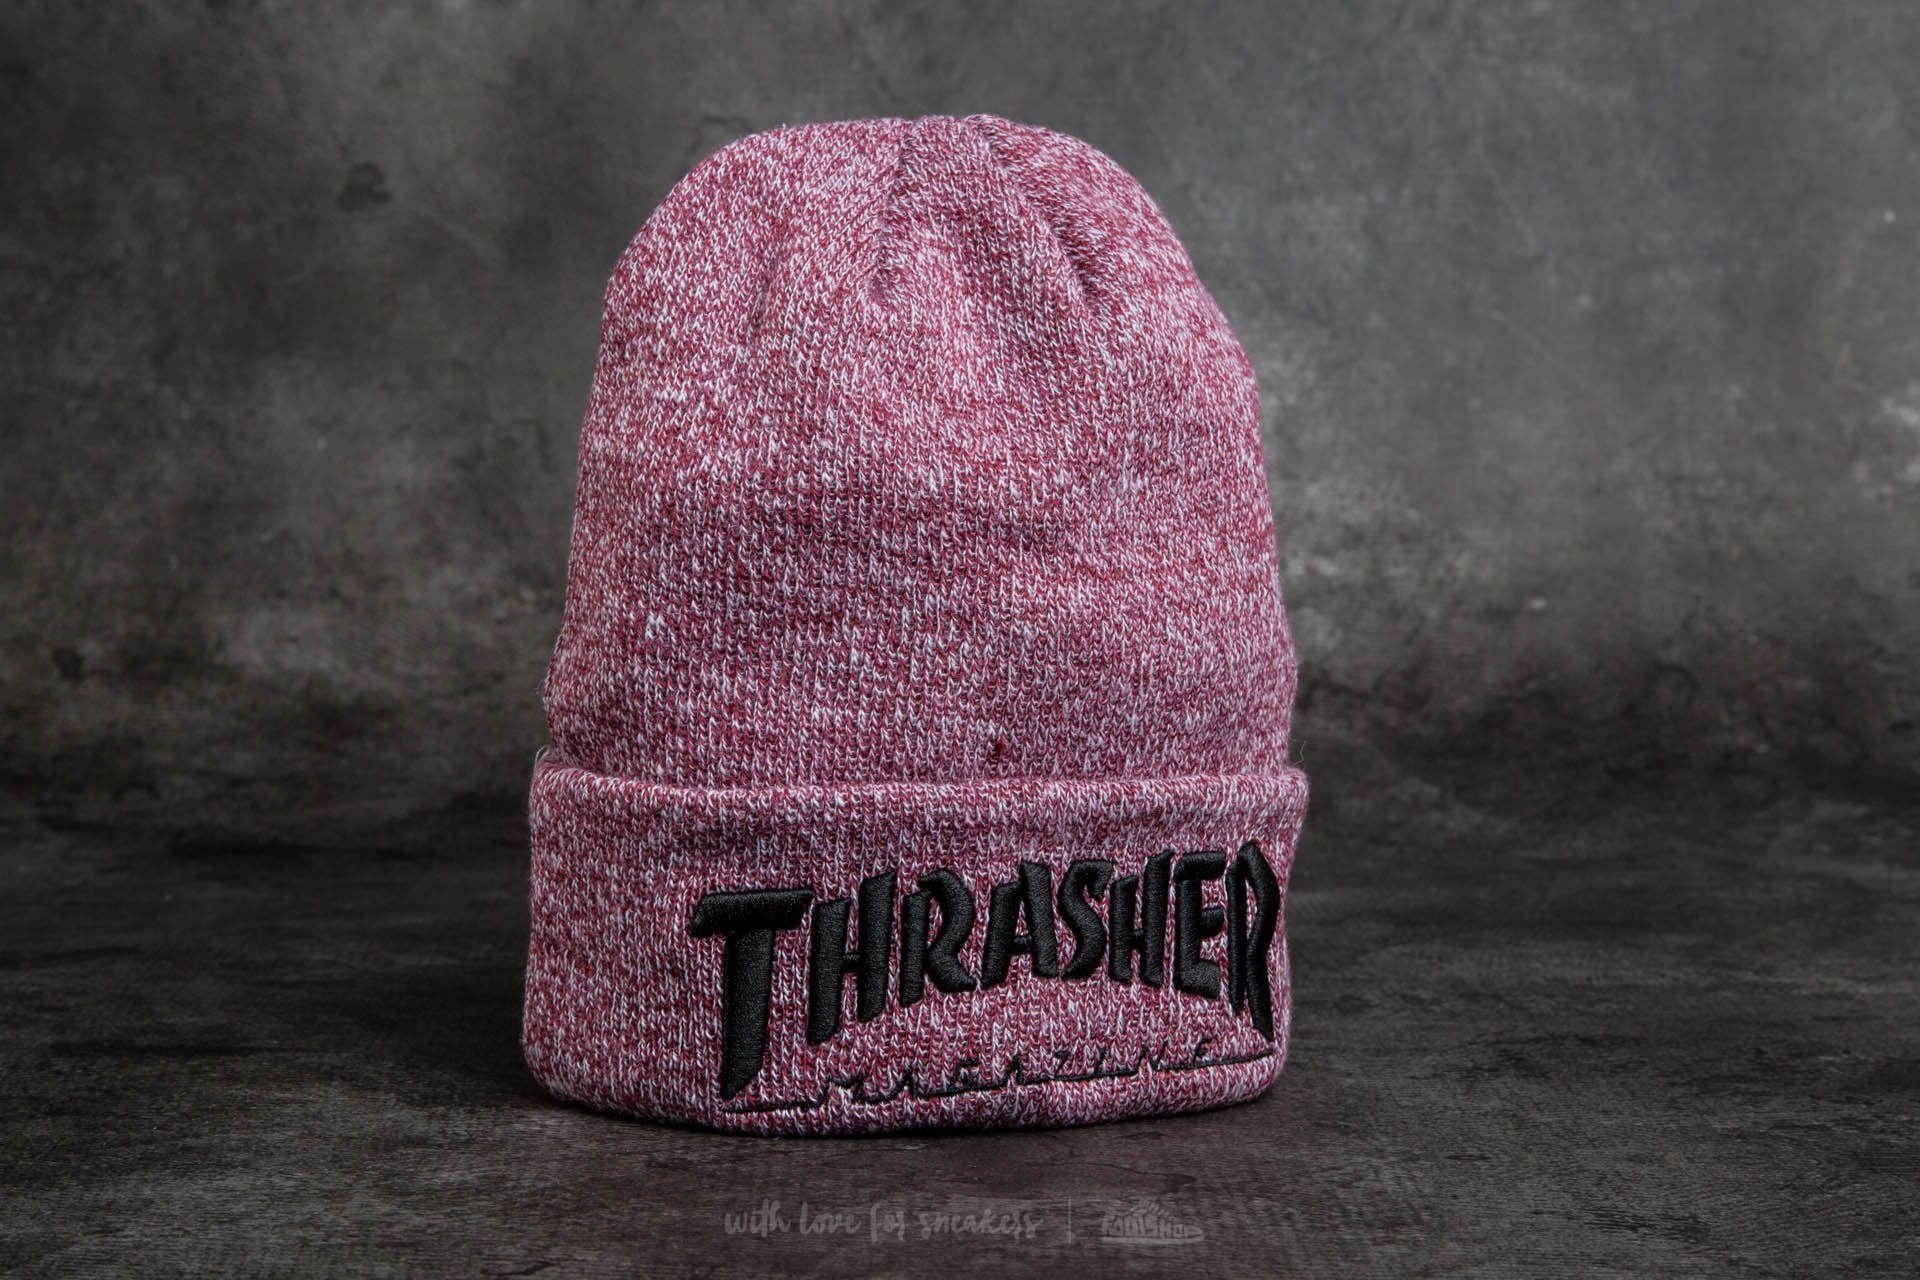 5aee6e4c0 Thrasher Embroidered Logo Beanie Heather Maroon/ Black | Footshop